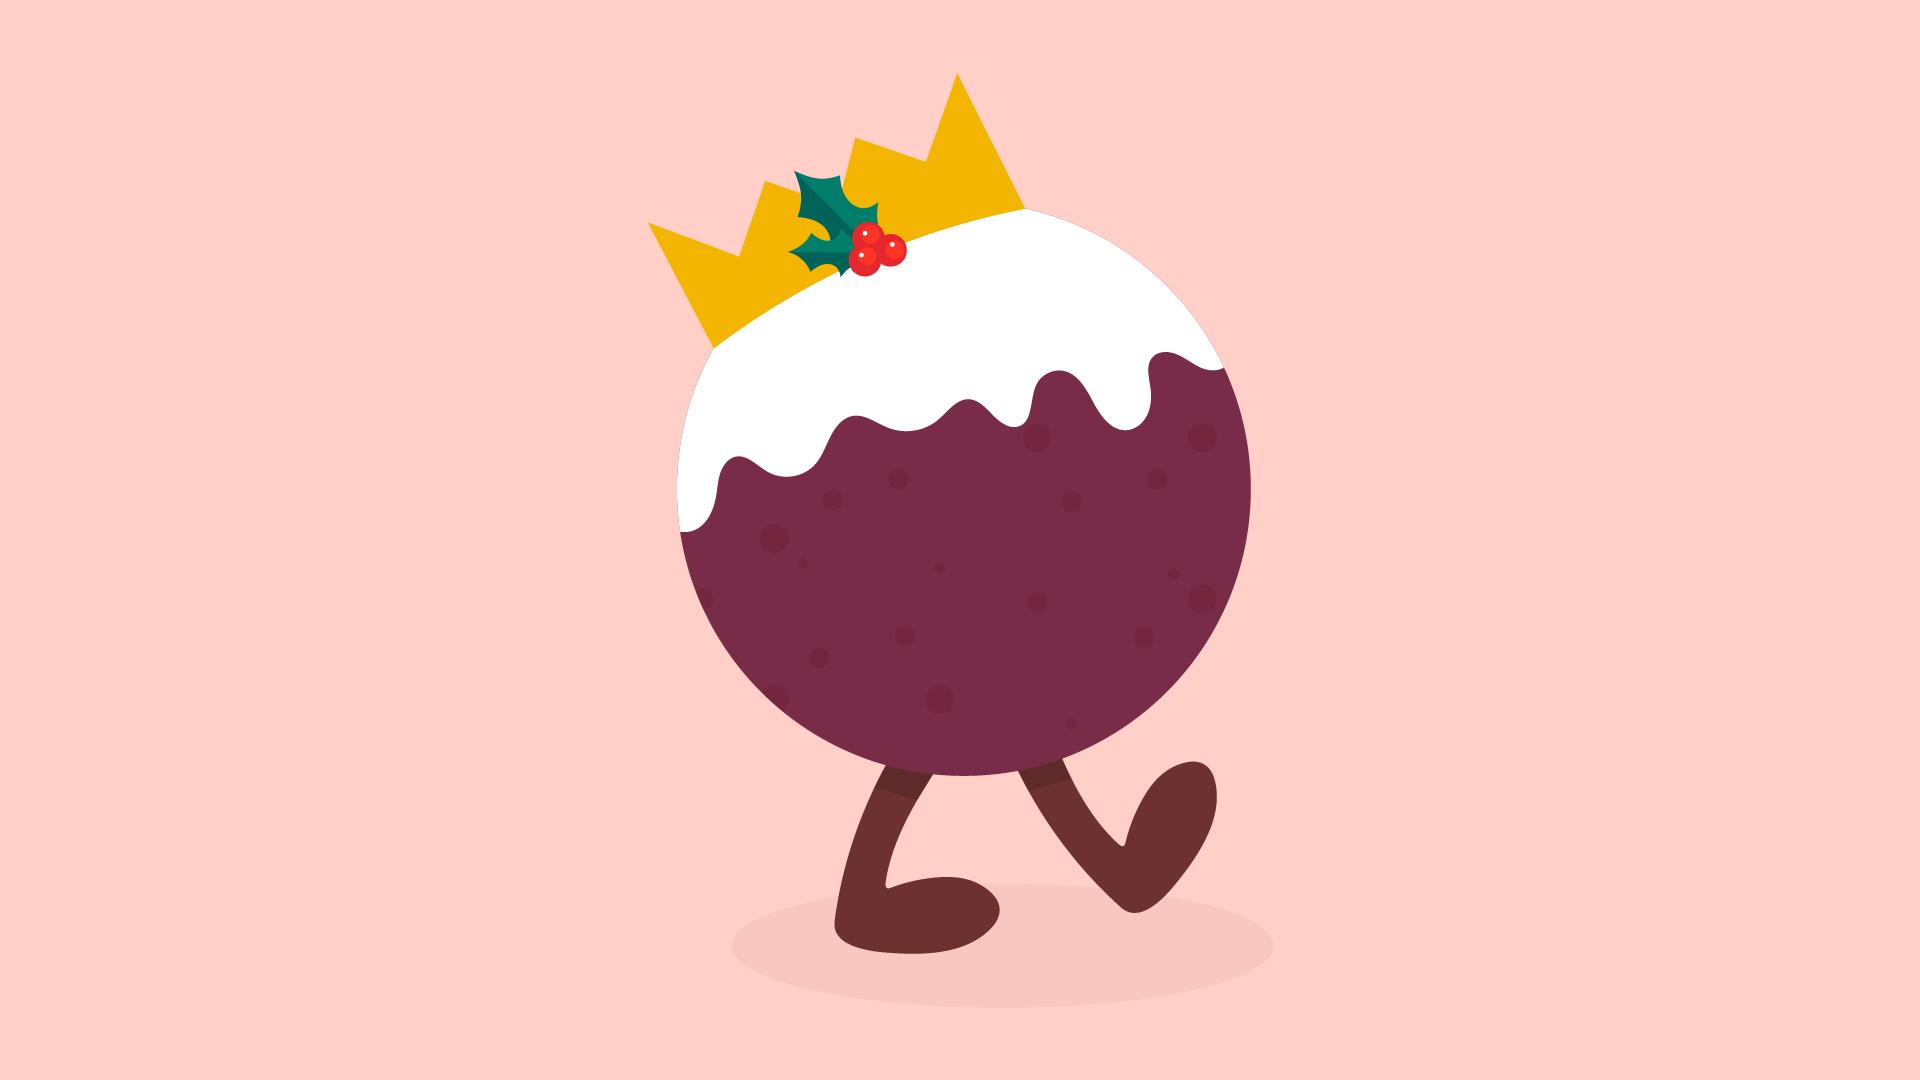 Christmas pudding illustration